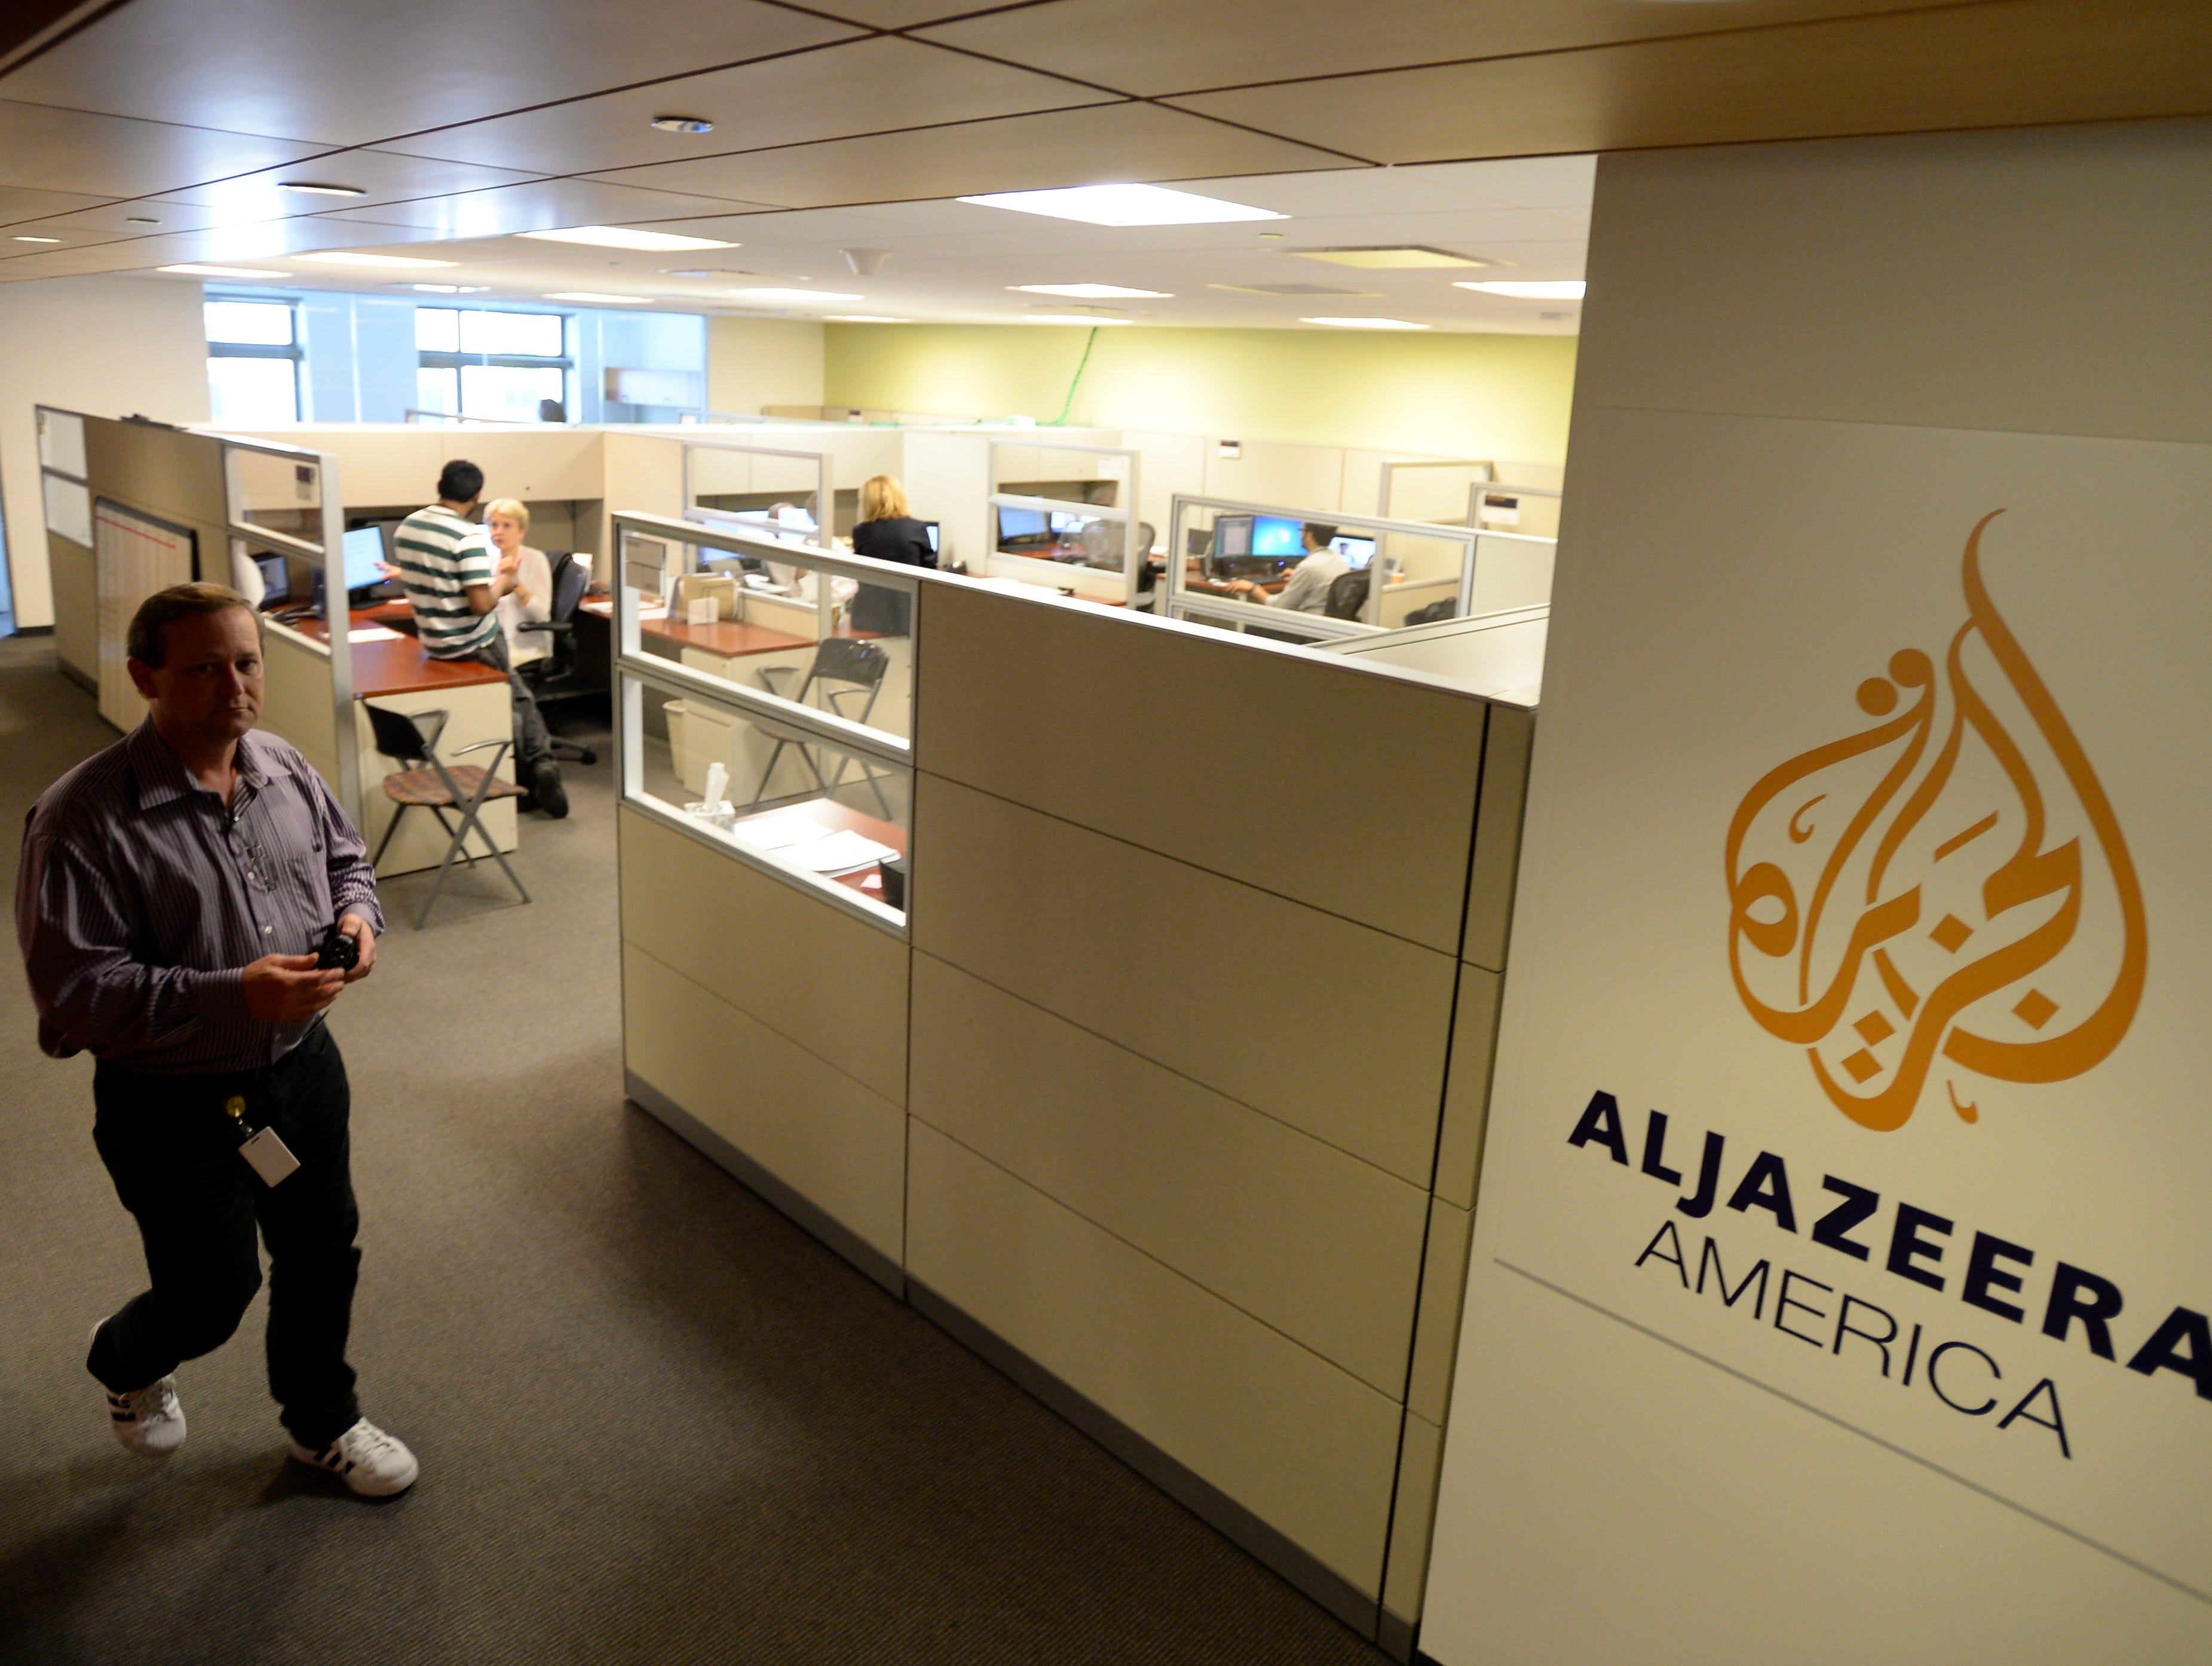 Al Jazeera America launches on Aug. 20